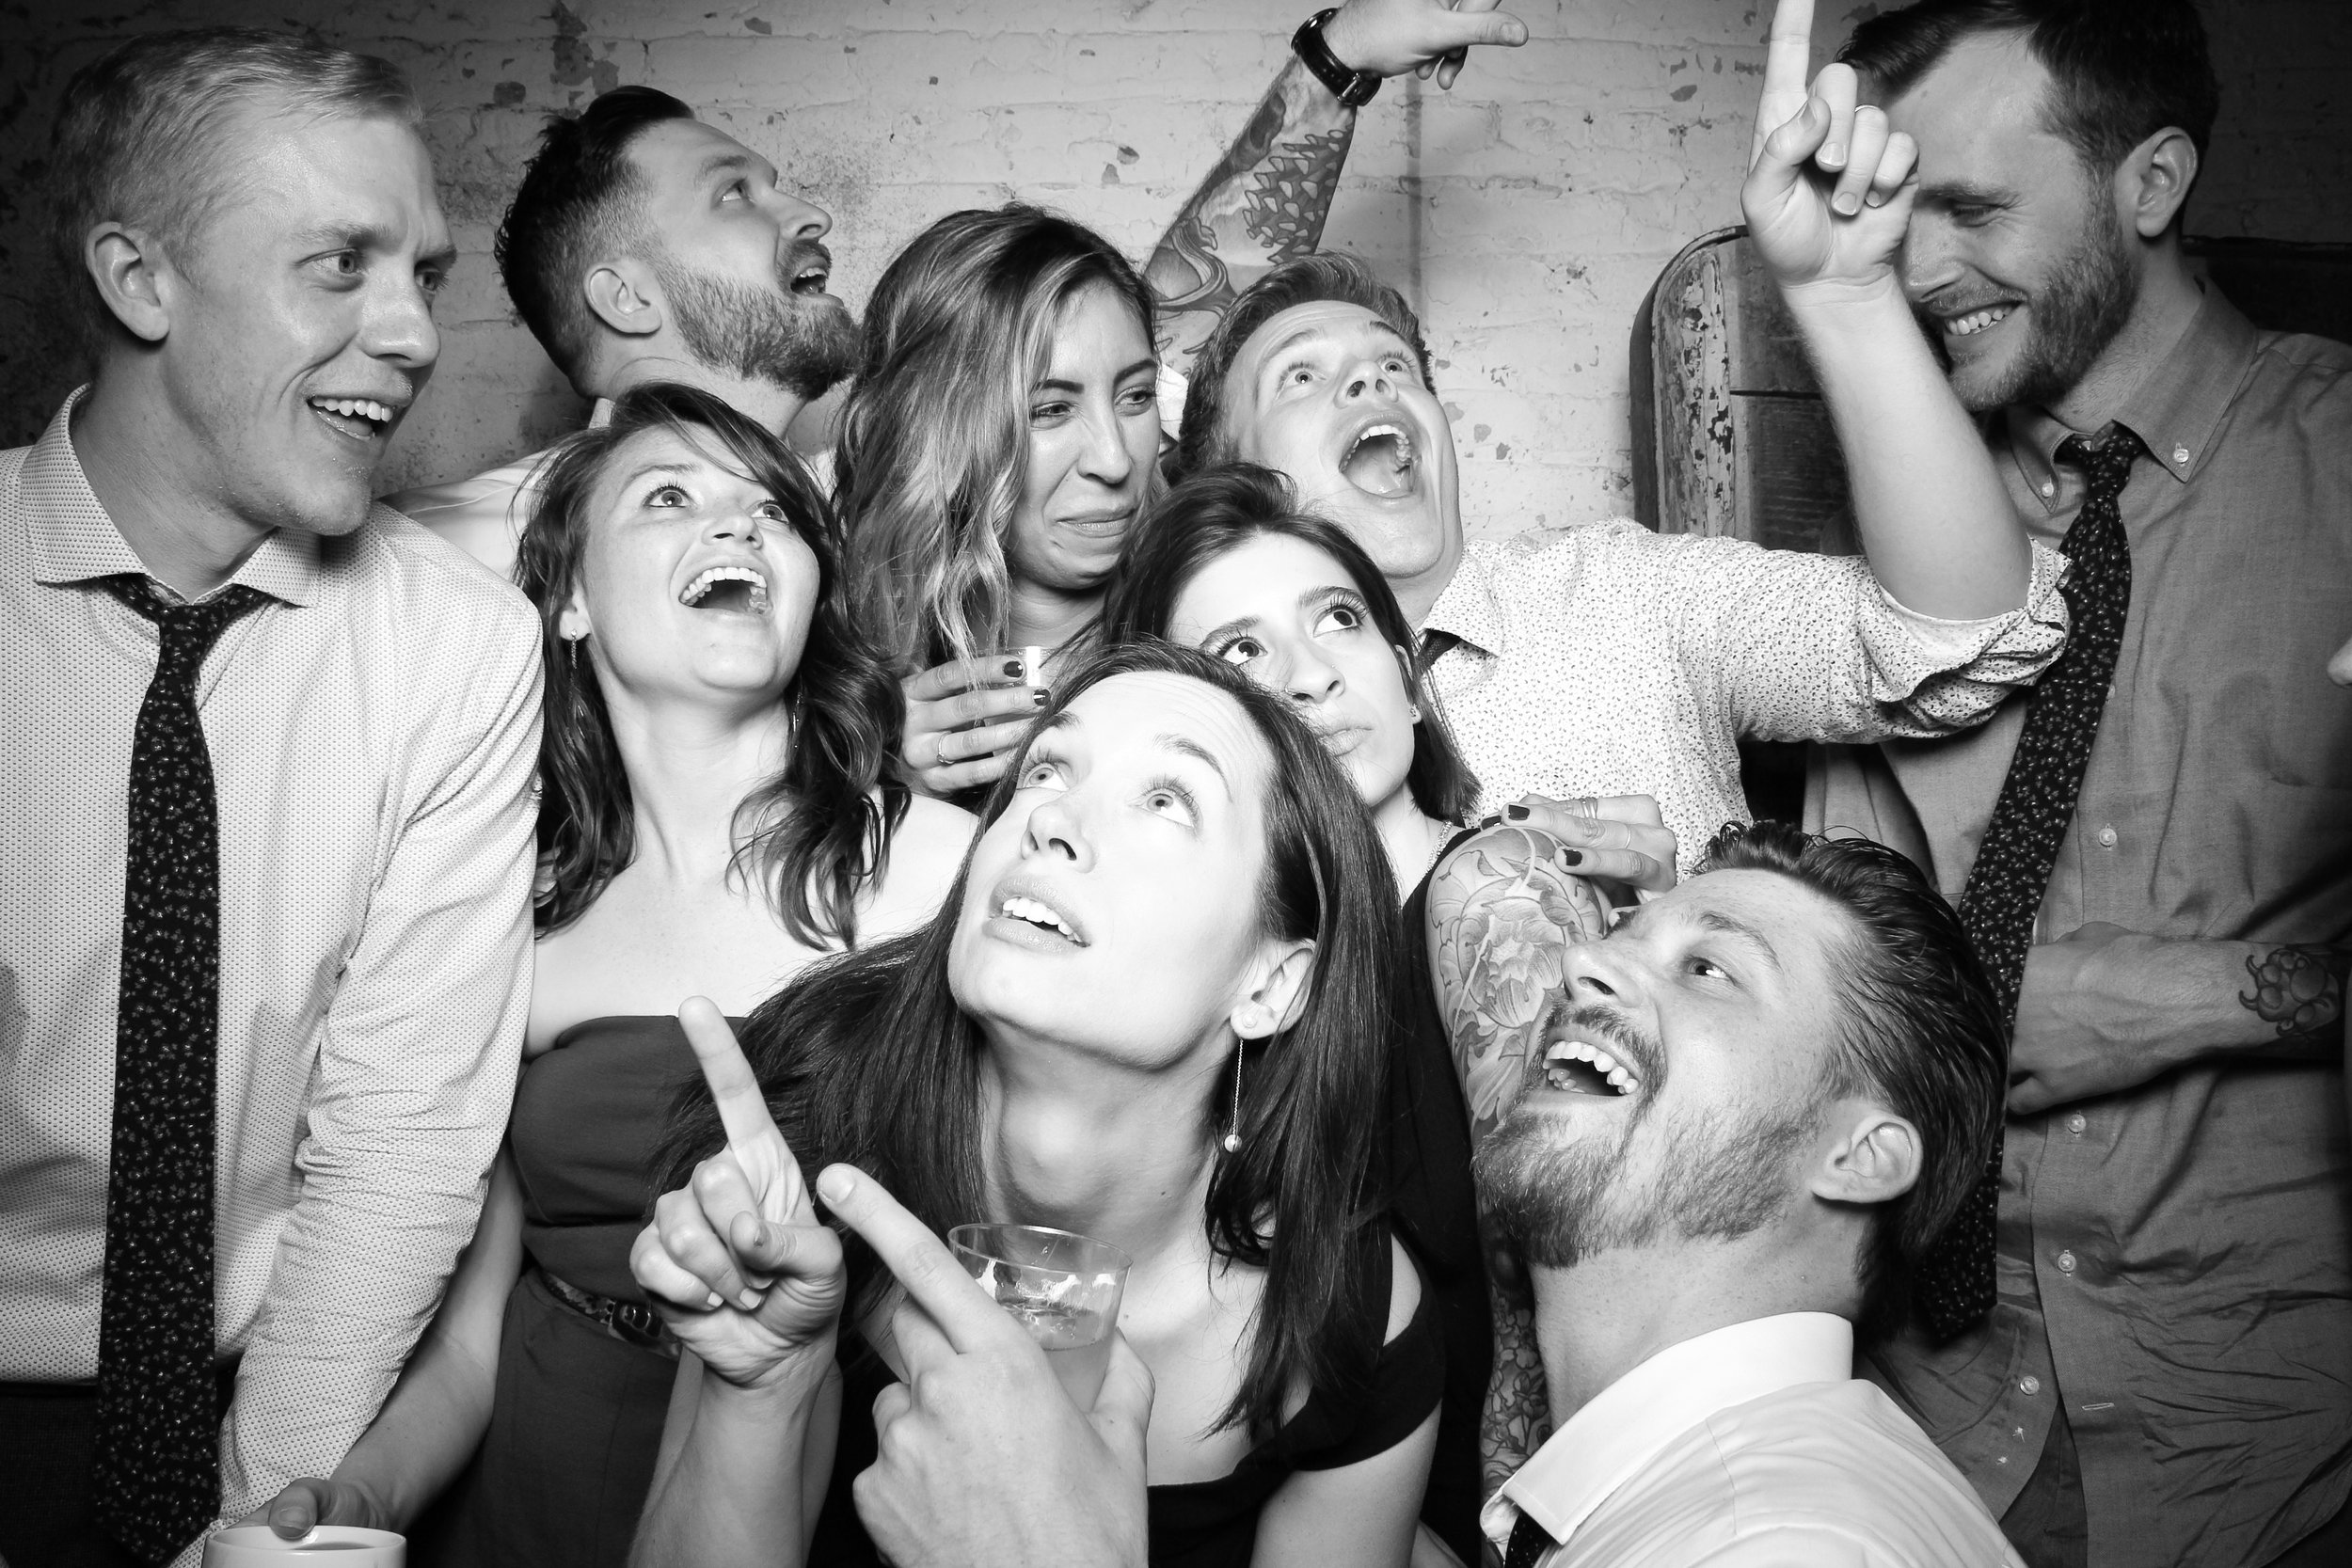 The_Joinery_Wedding_Venue_Logan_Square_Reception_36.jpg